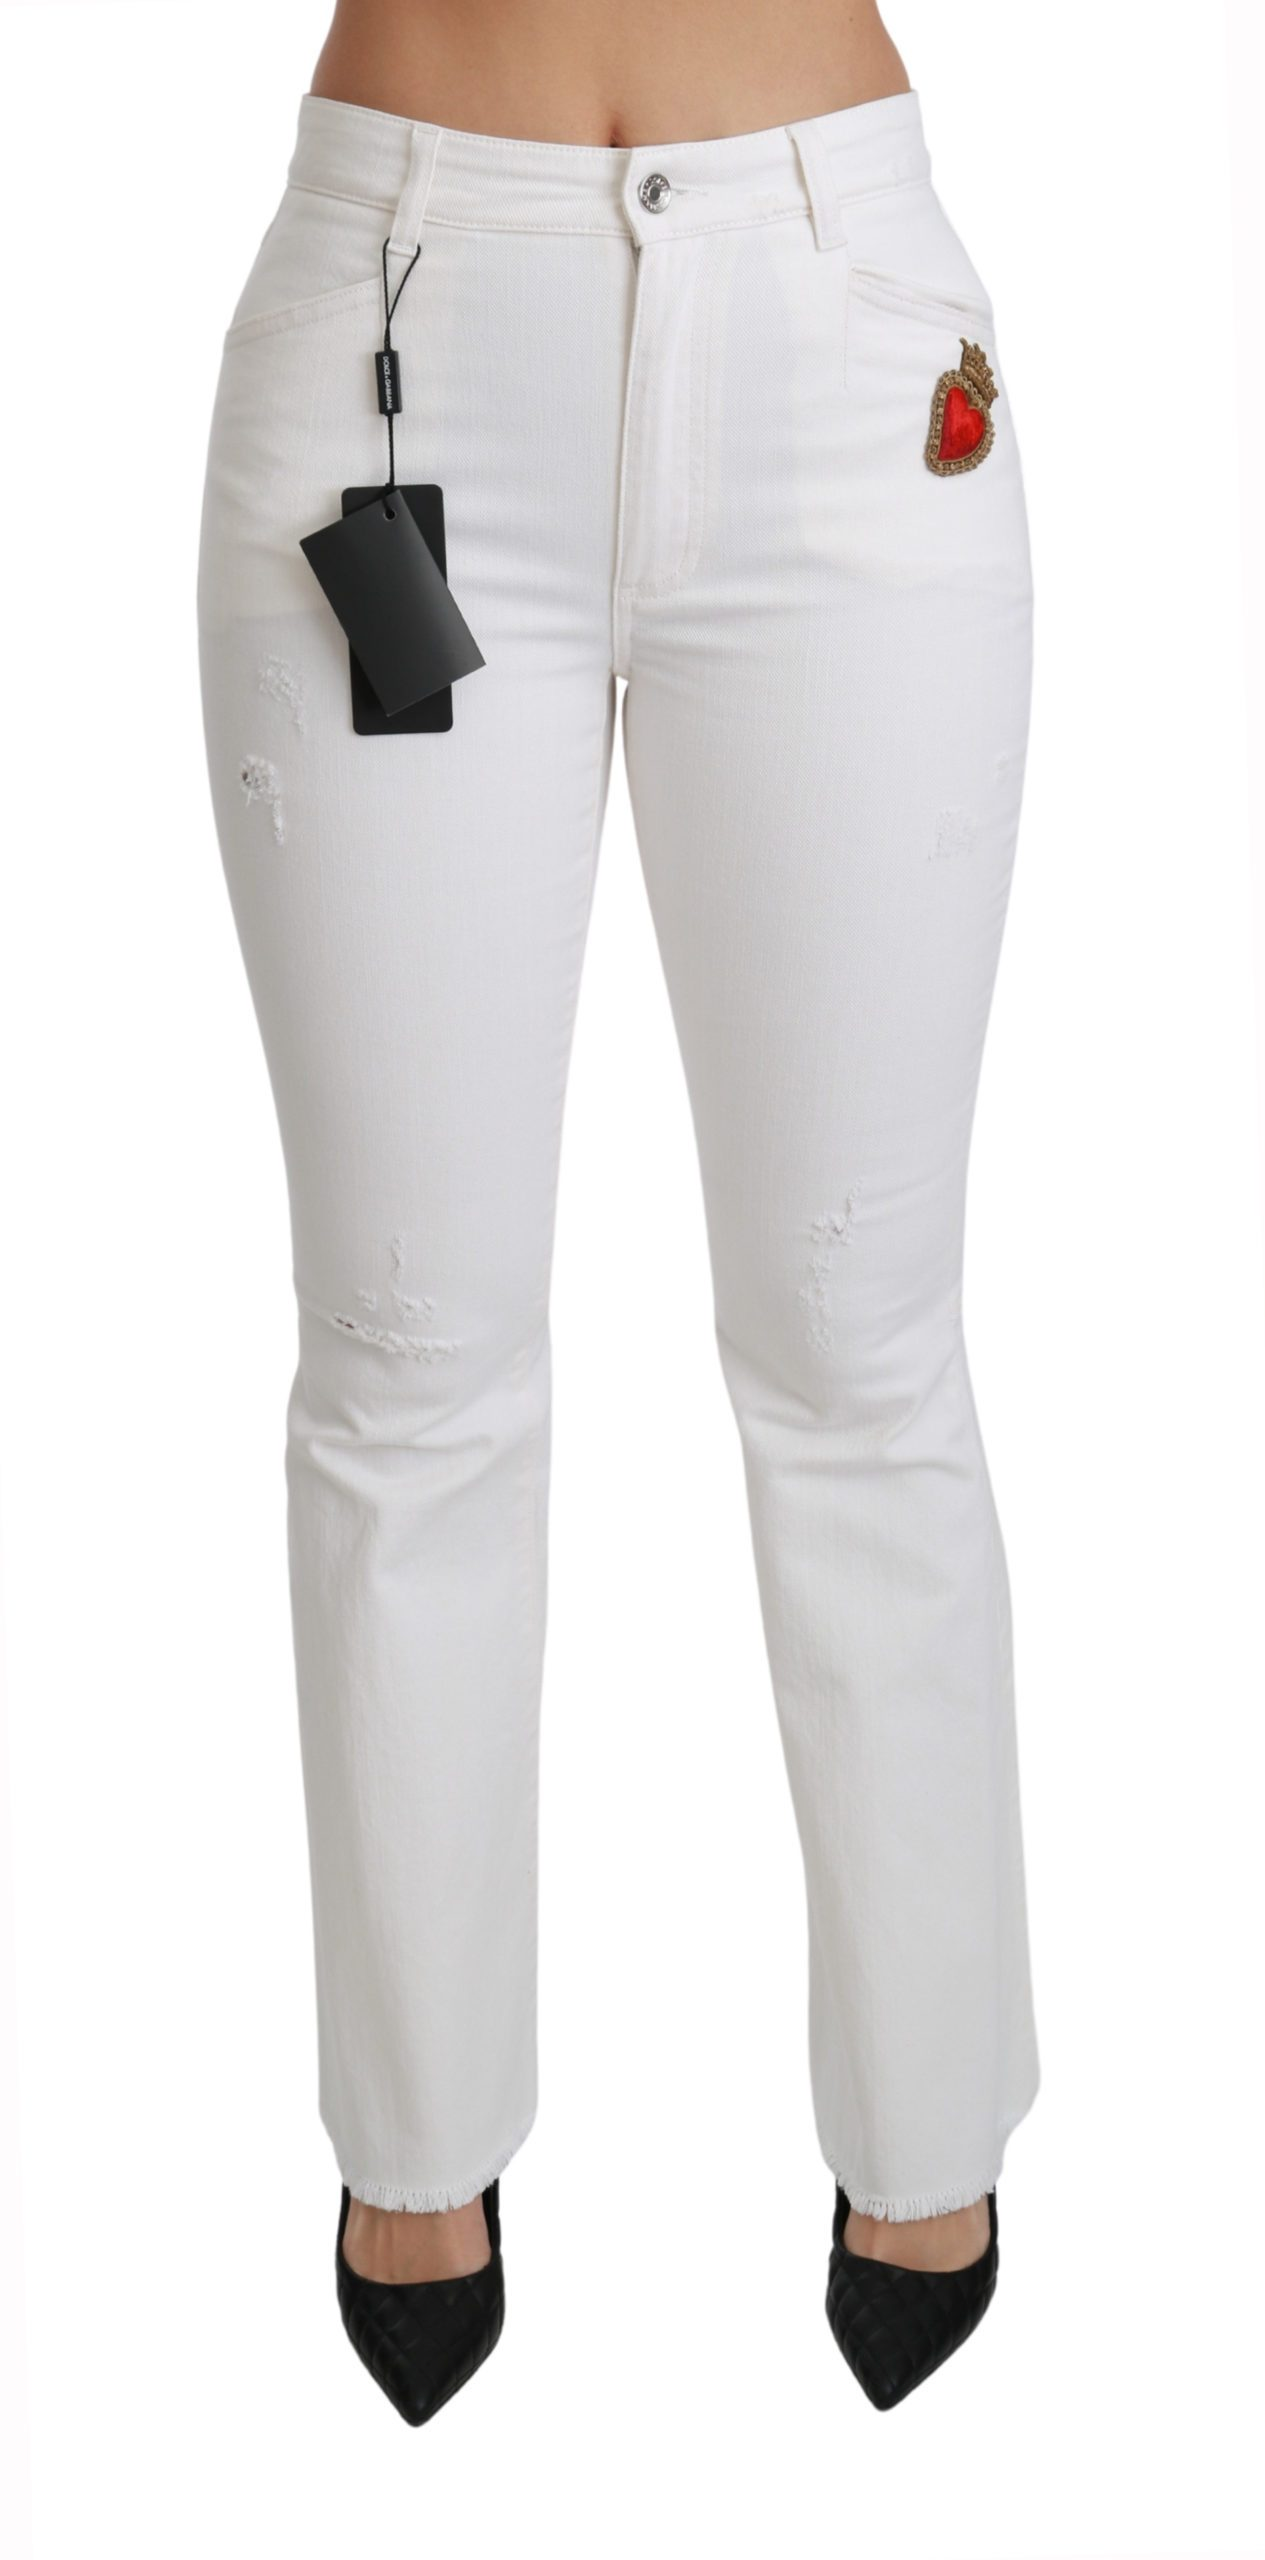 Dolce & Gabbana Women's Heart Flared Stretch Cotton Trouser White PAN70897 - IT36   XS